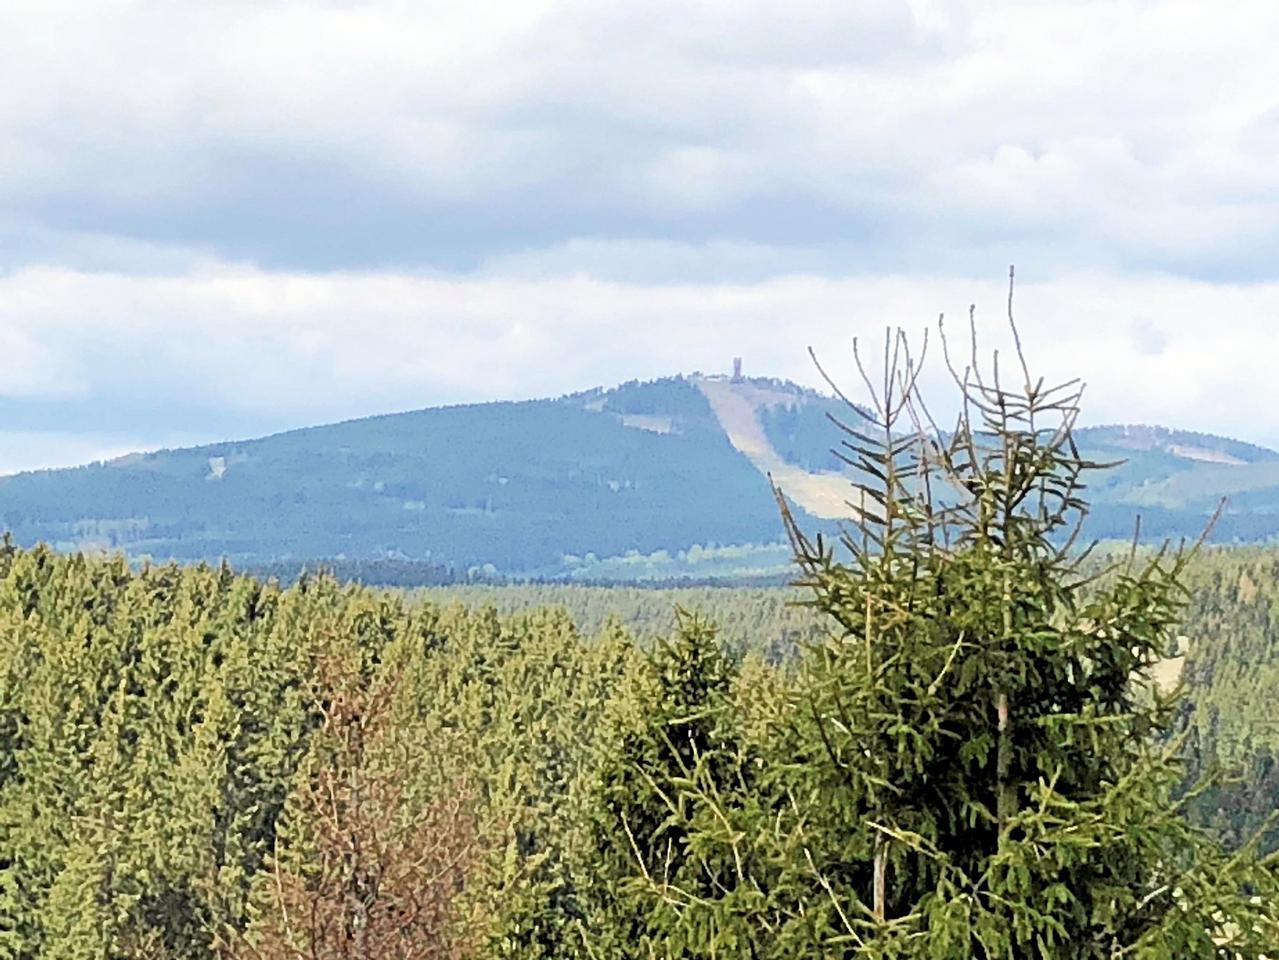 Kahlschlag am Wurmberg gegen Borkenkäfer